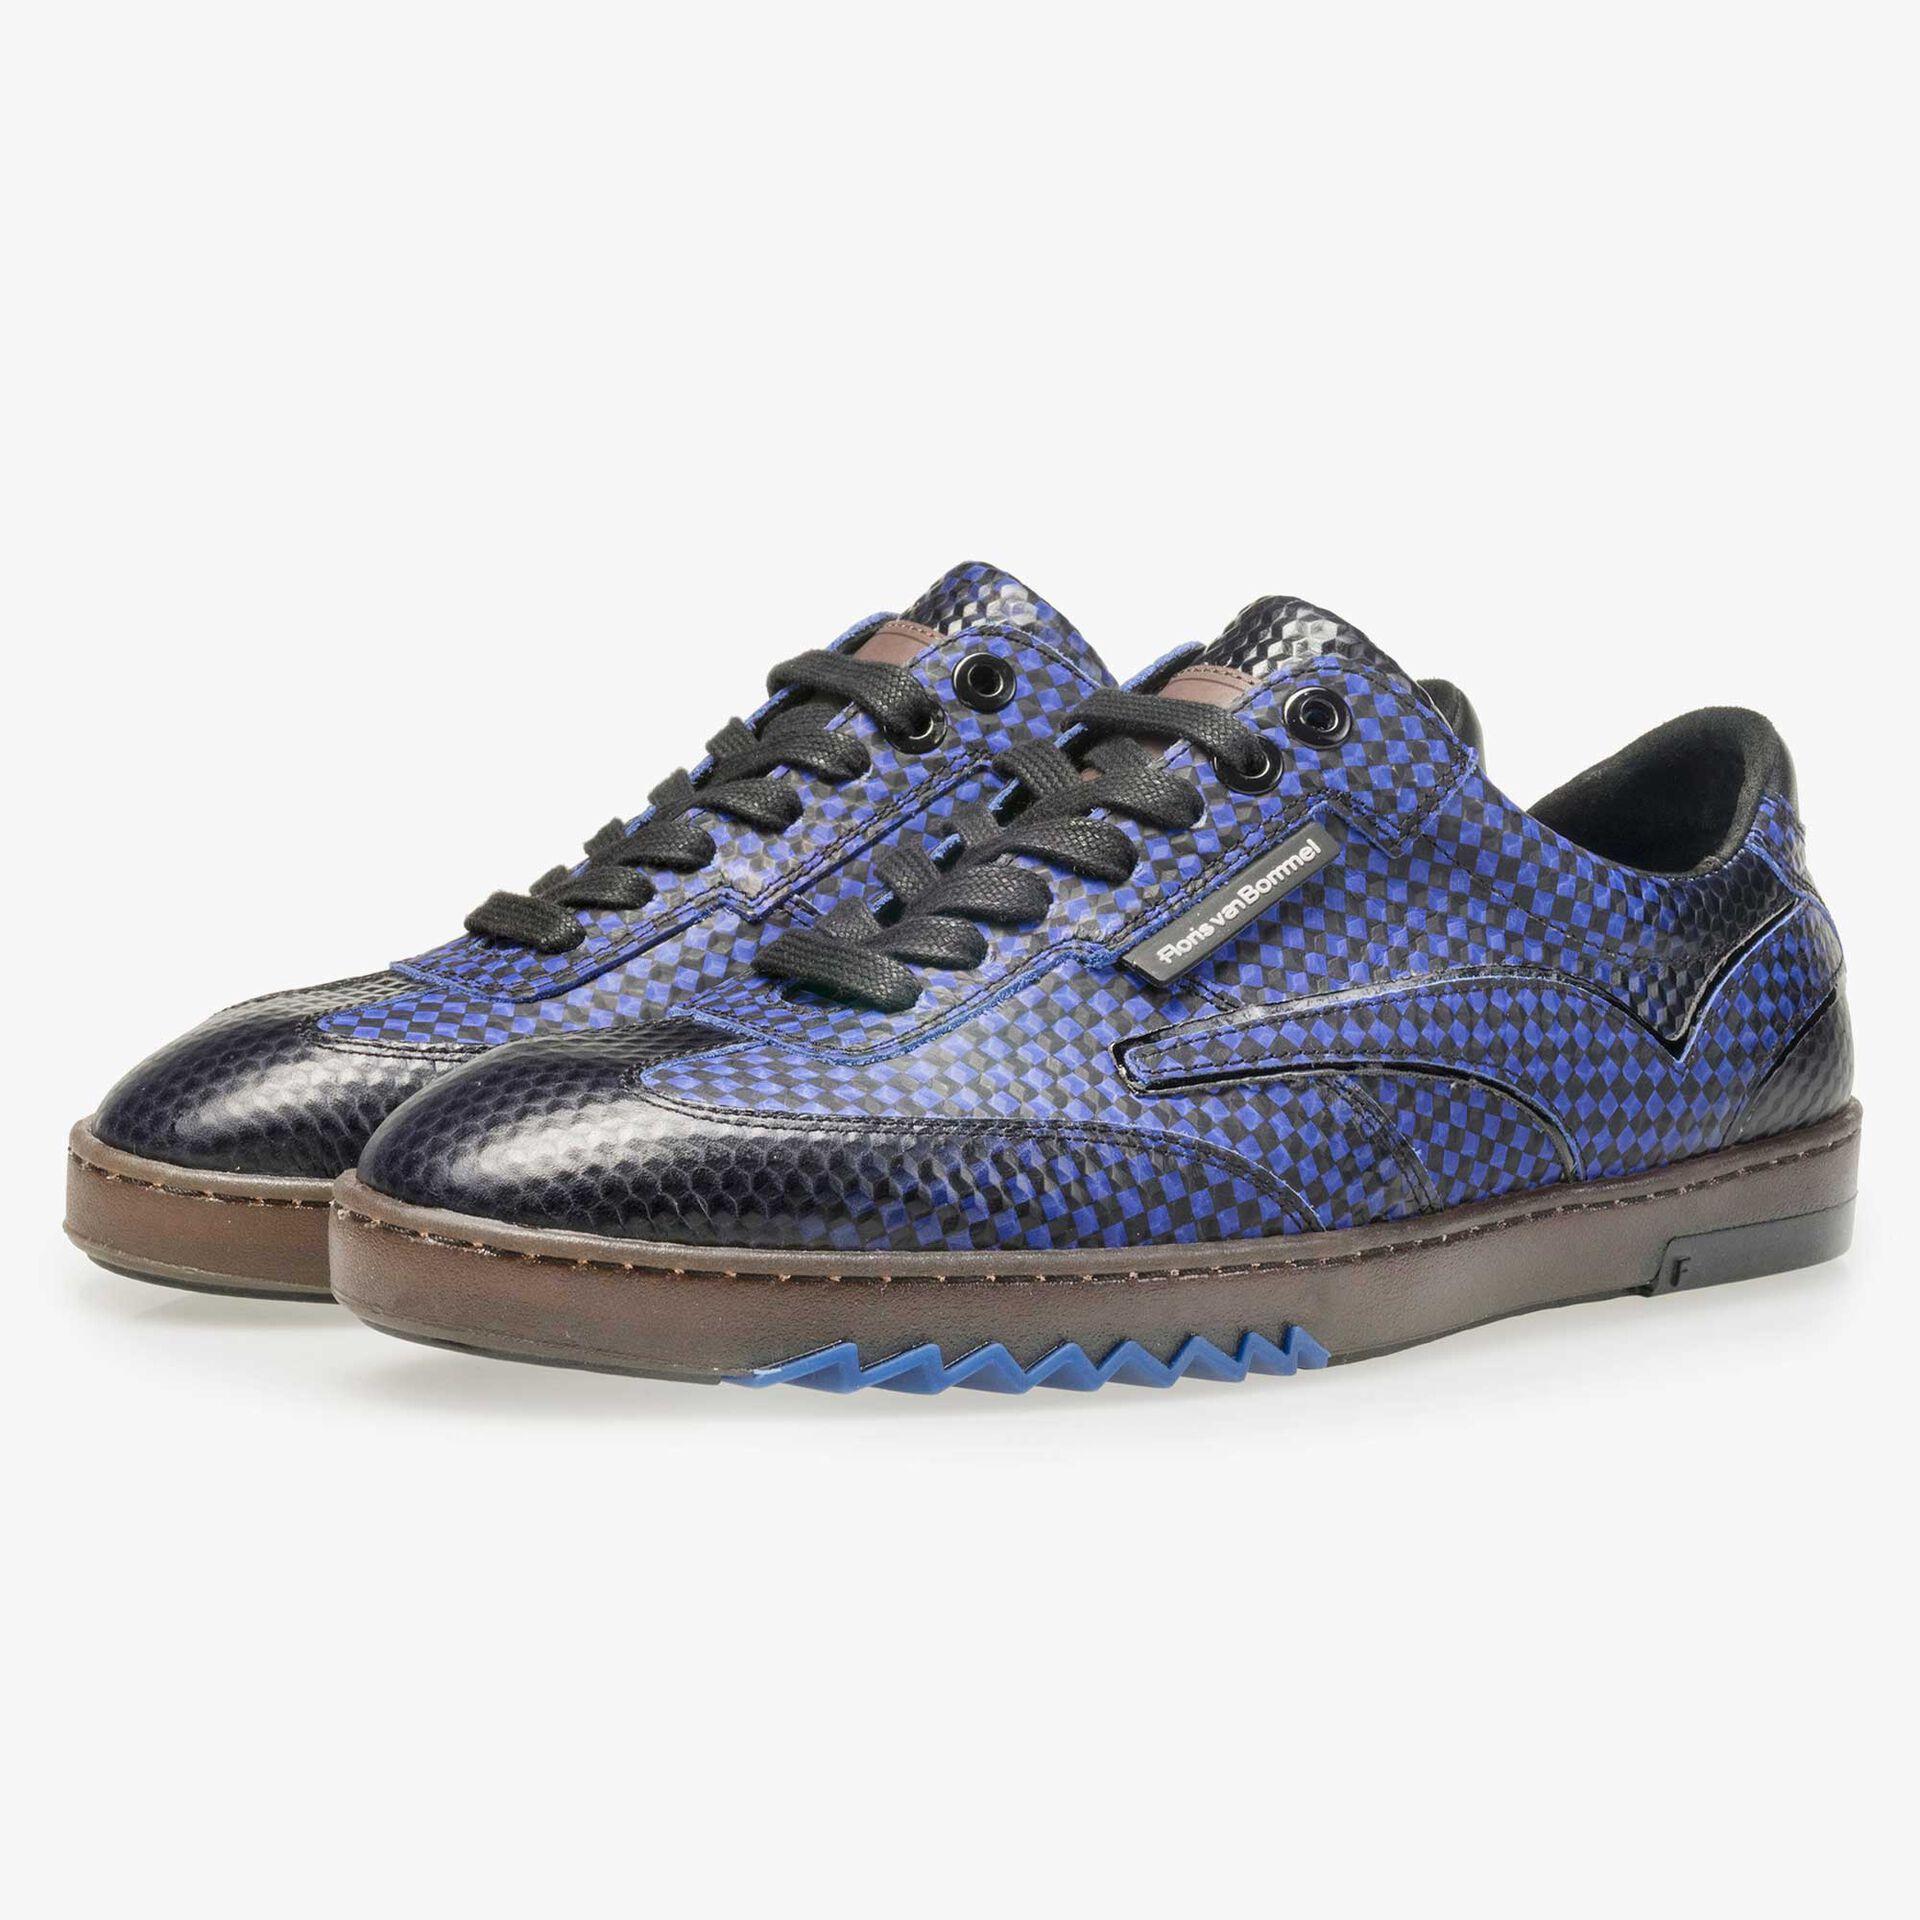 Floris van Bommel men's electric blue sneaker finished with a black print